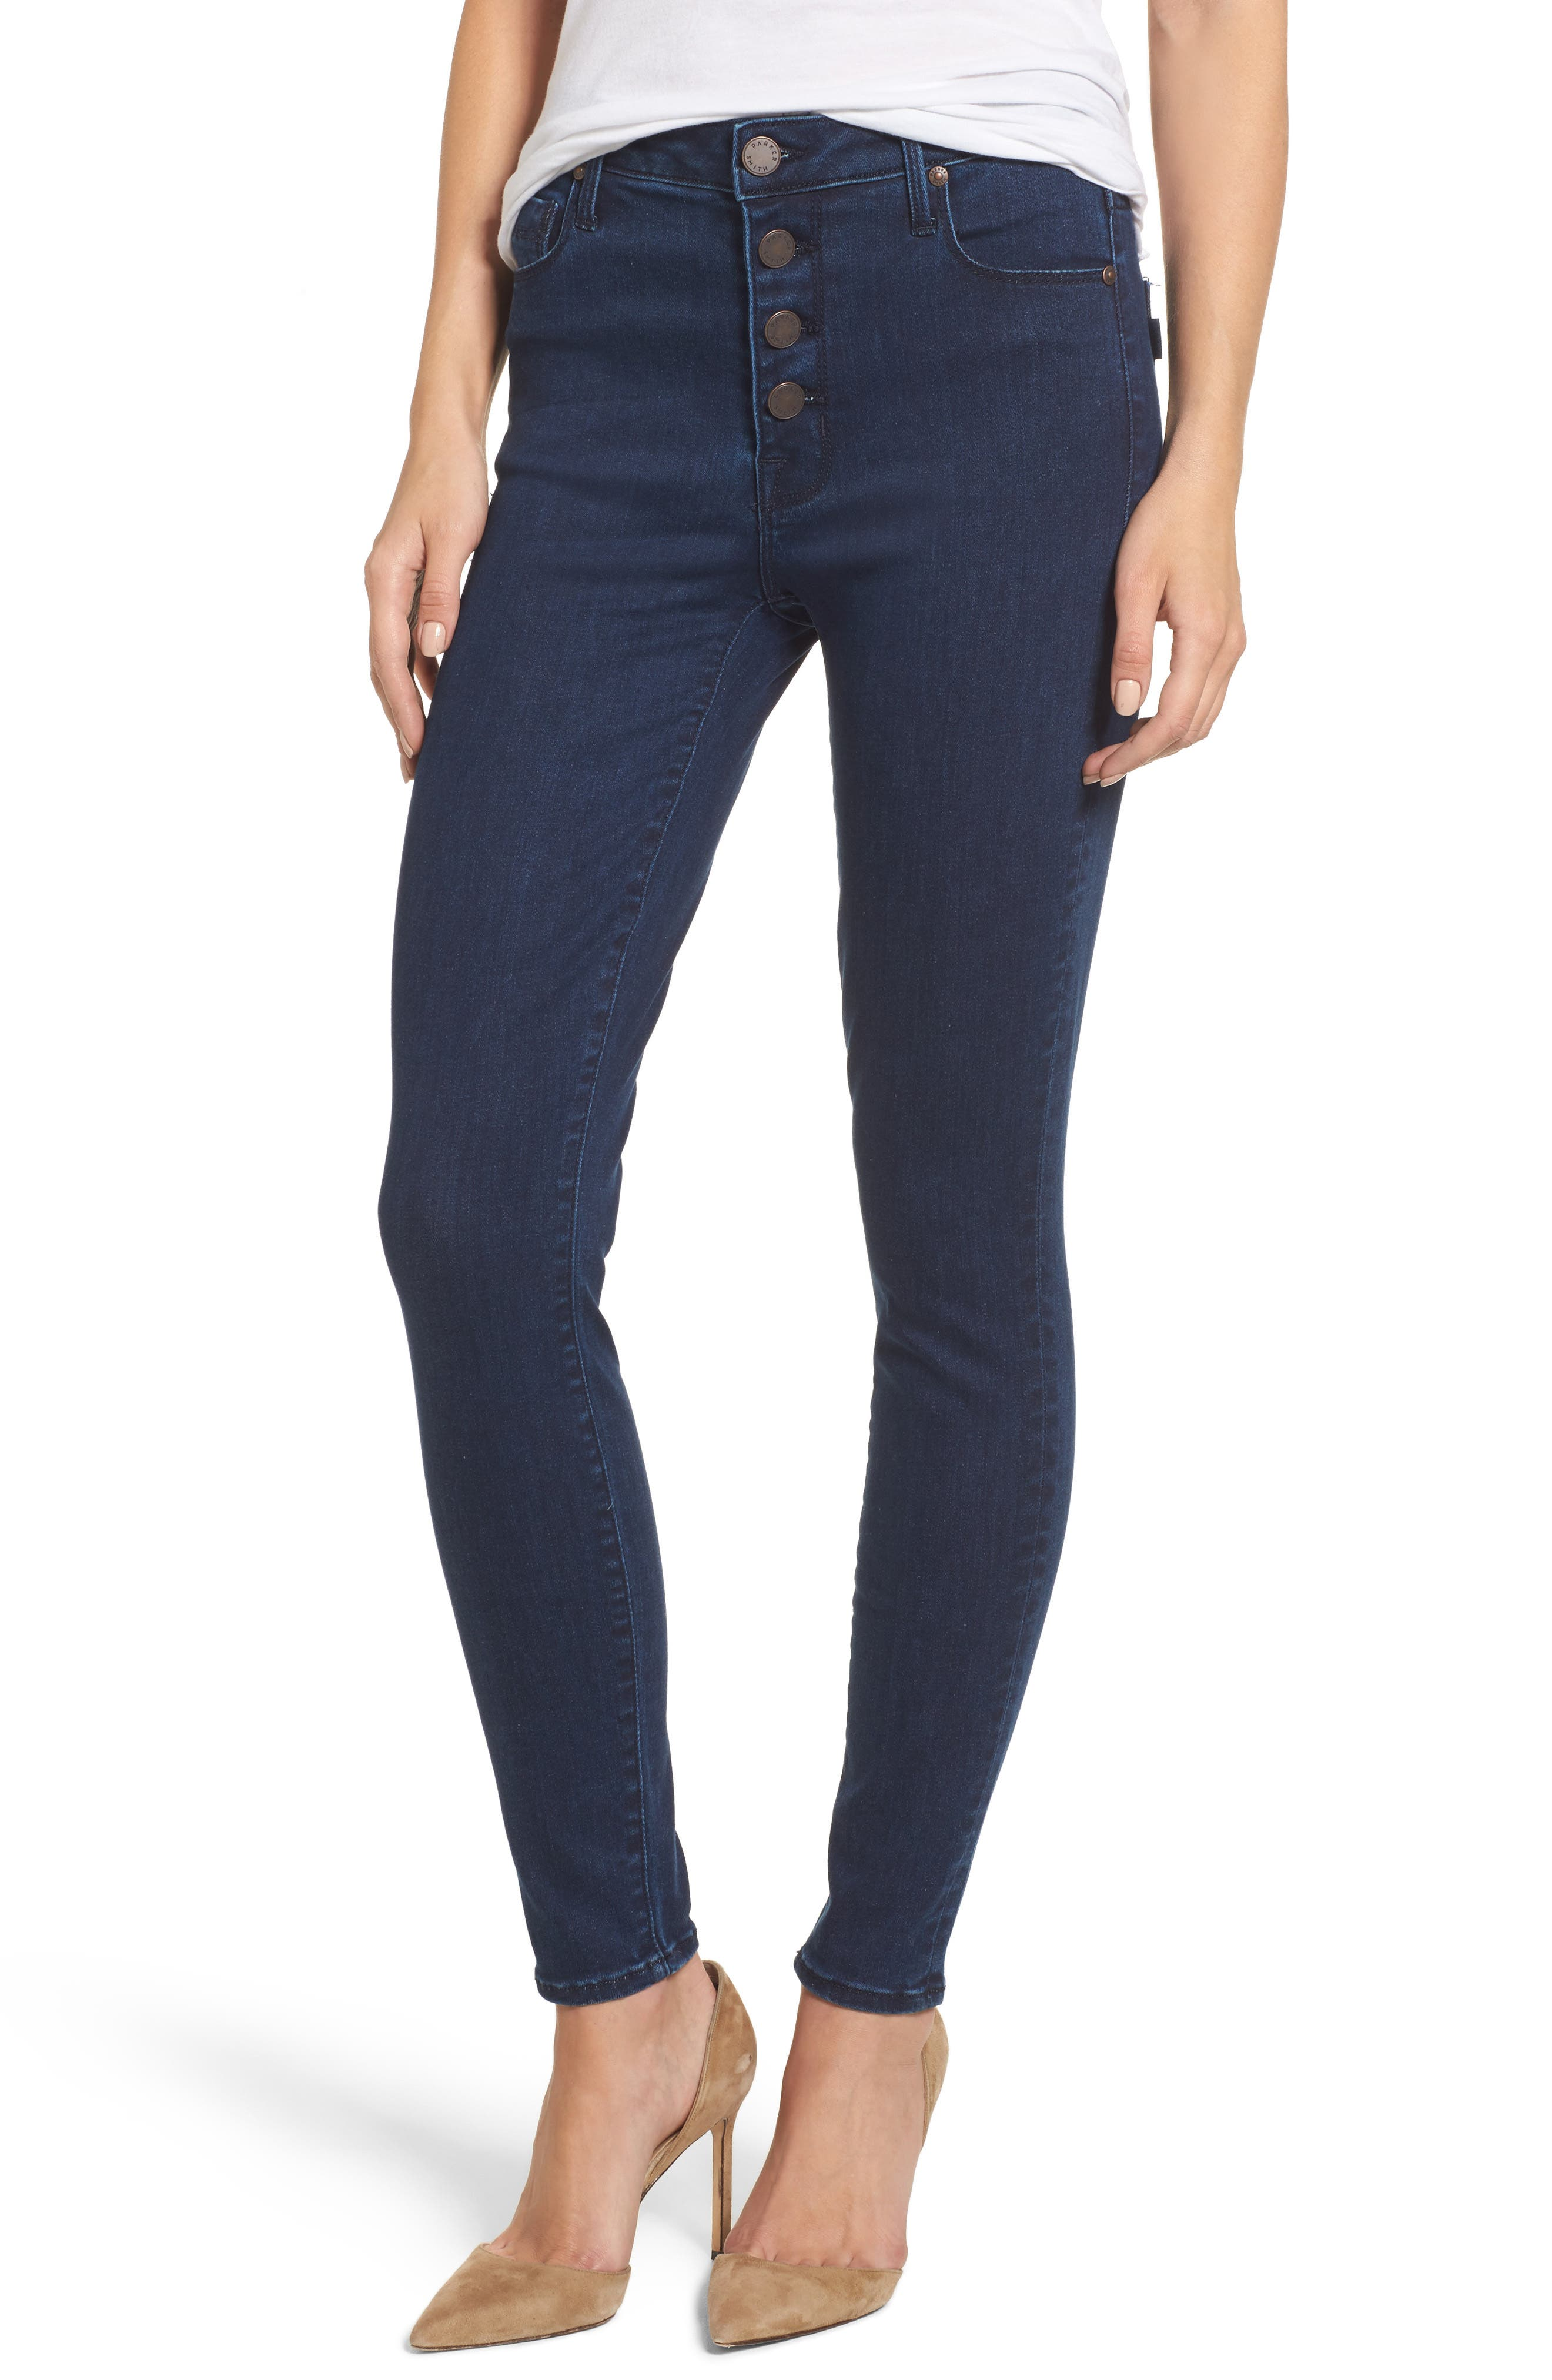 Bombshell High Waist Skinny Jeans,                         Main,                         color, 401